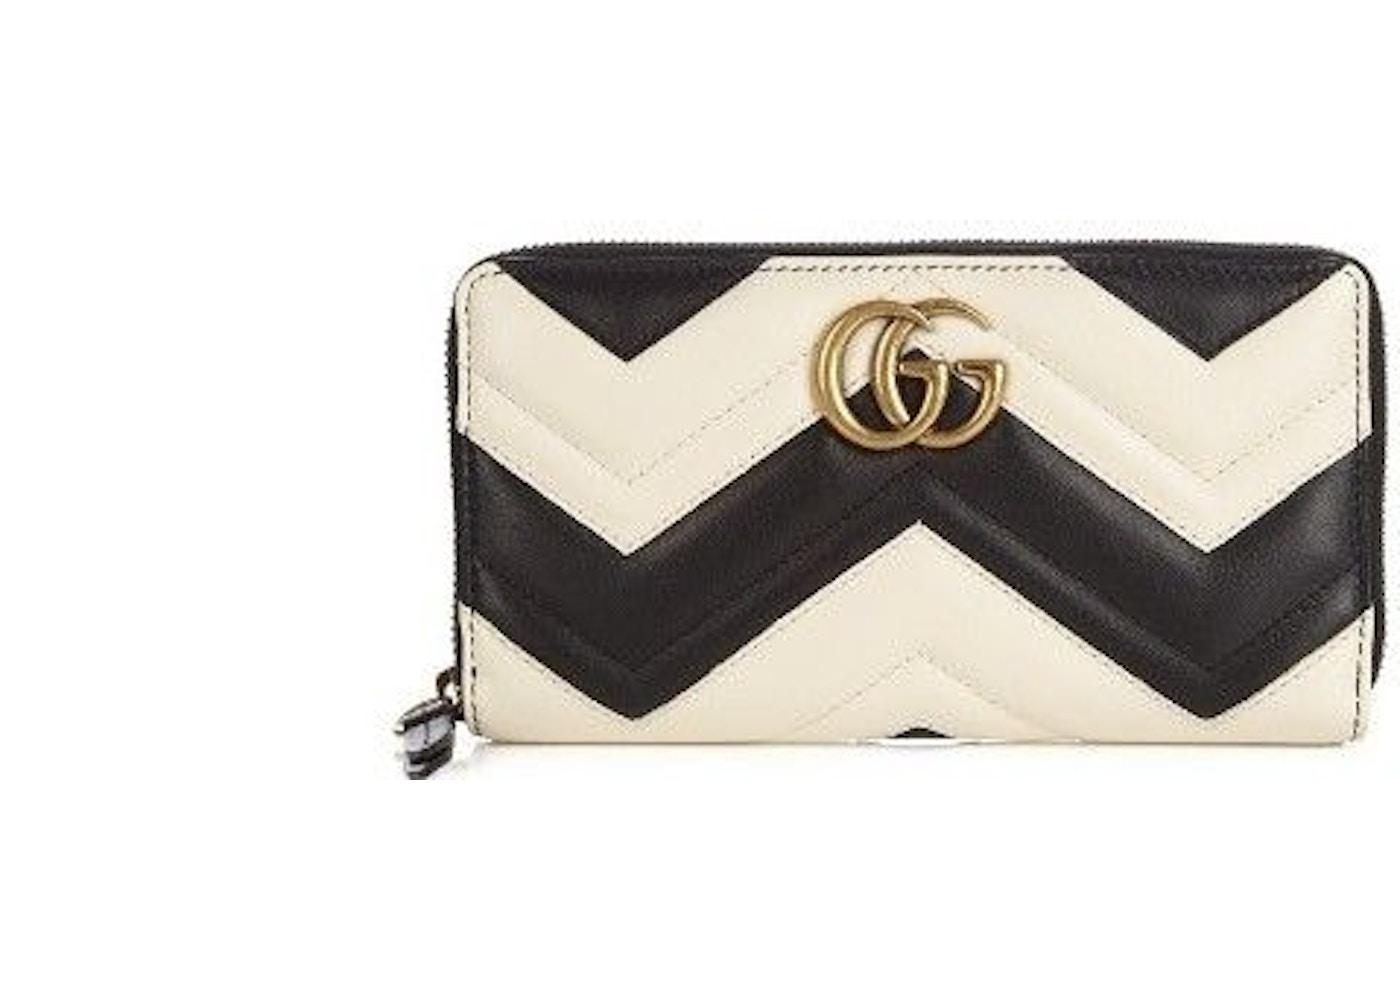 f171e6442b02 Gucci Marmont Wallet Zip Around Matelasse Black/White. Matelasse Black/White